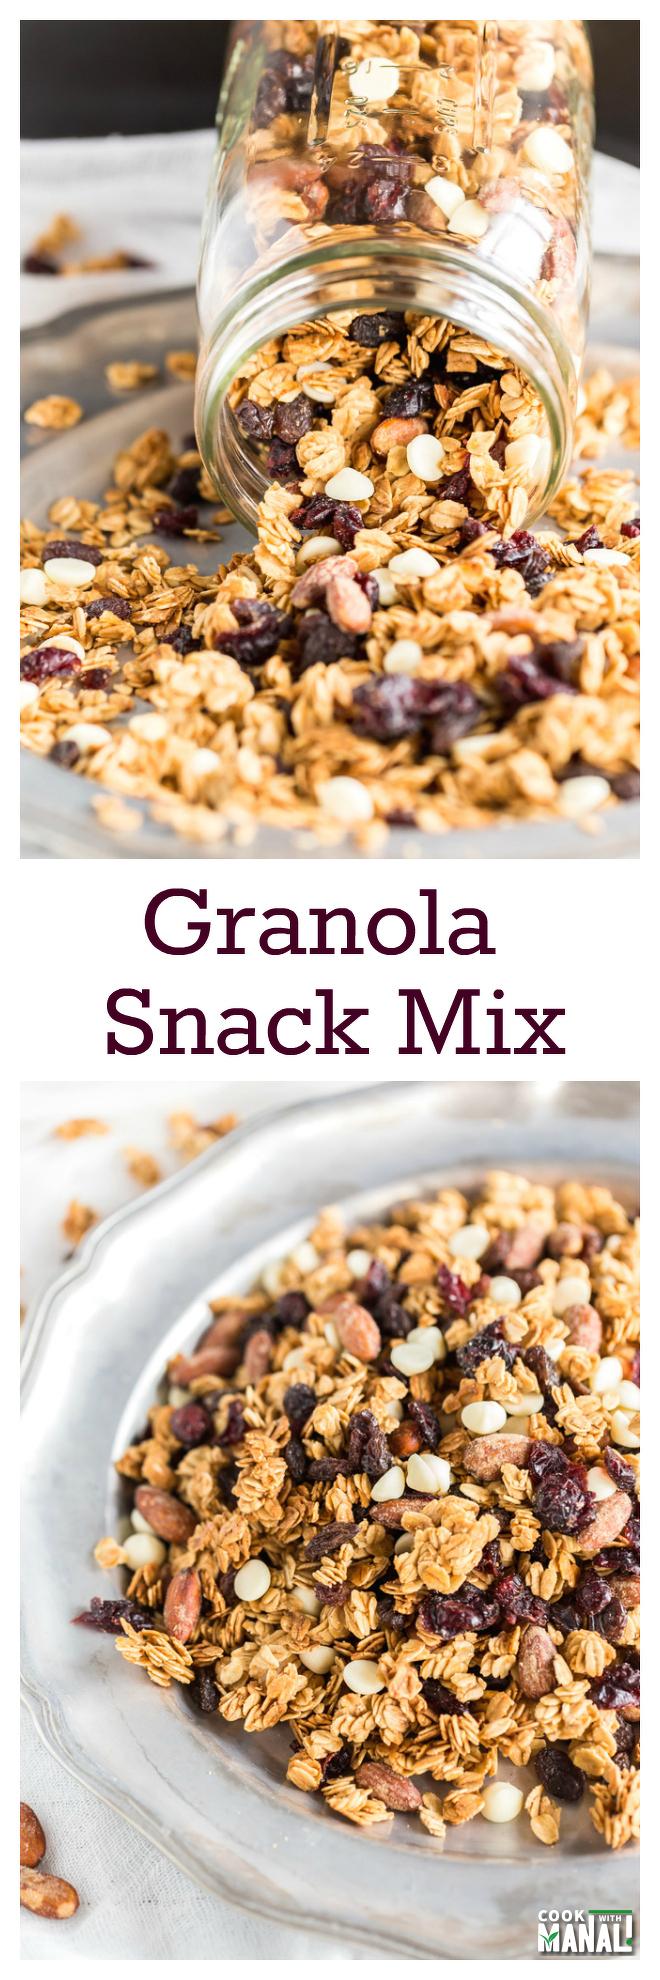 Granola Snack Mix Collage